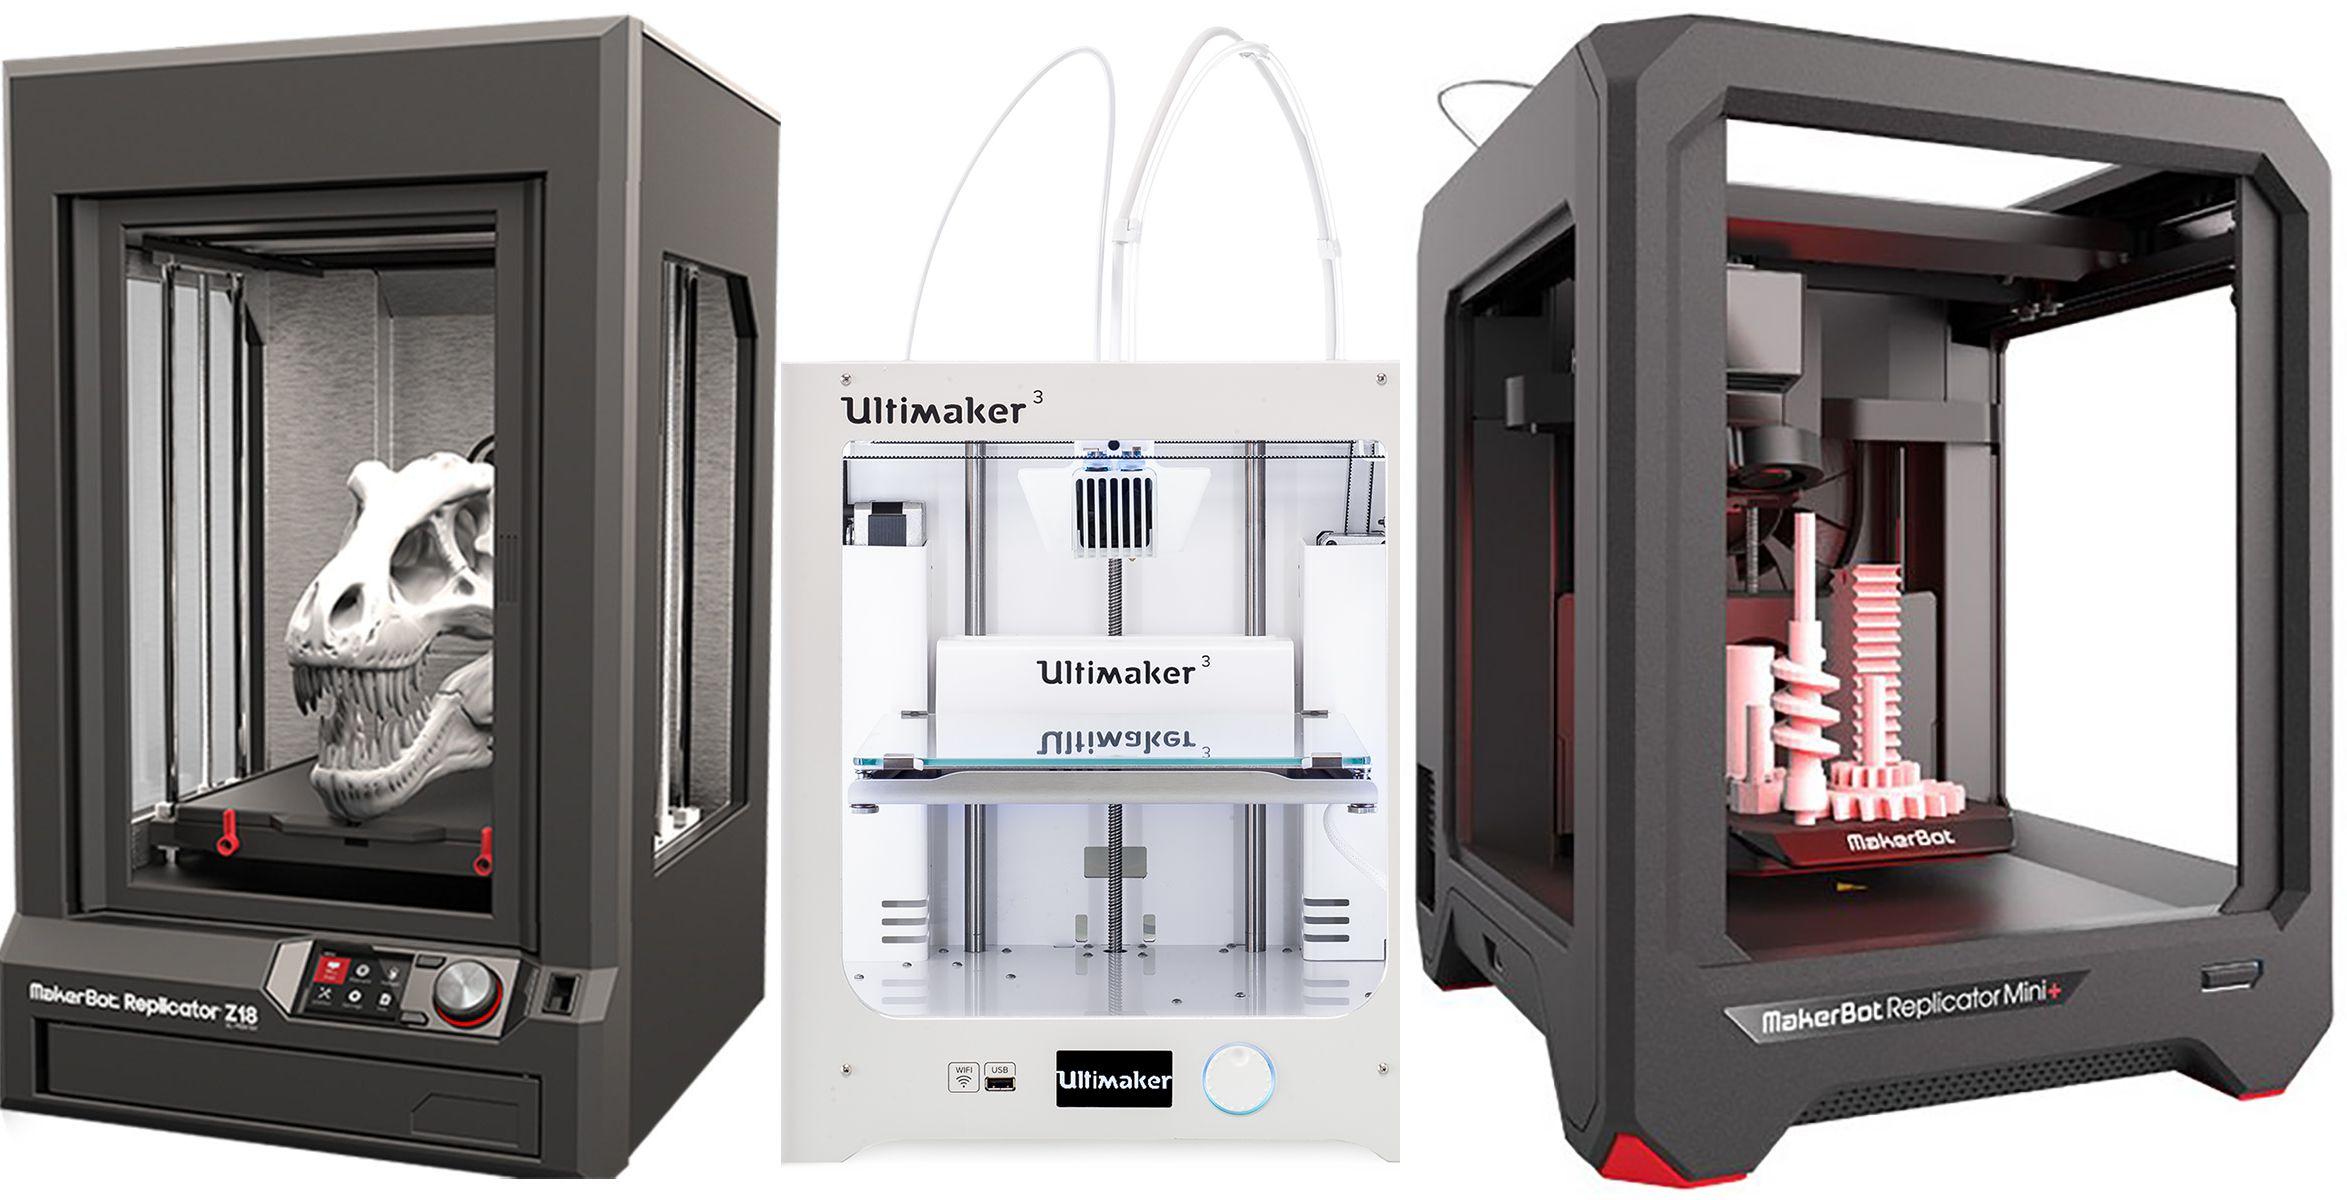 3D-Drucker-Ratgeber-Index-Card